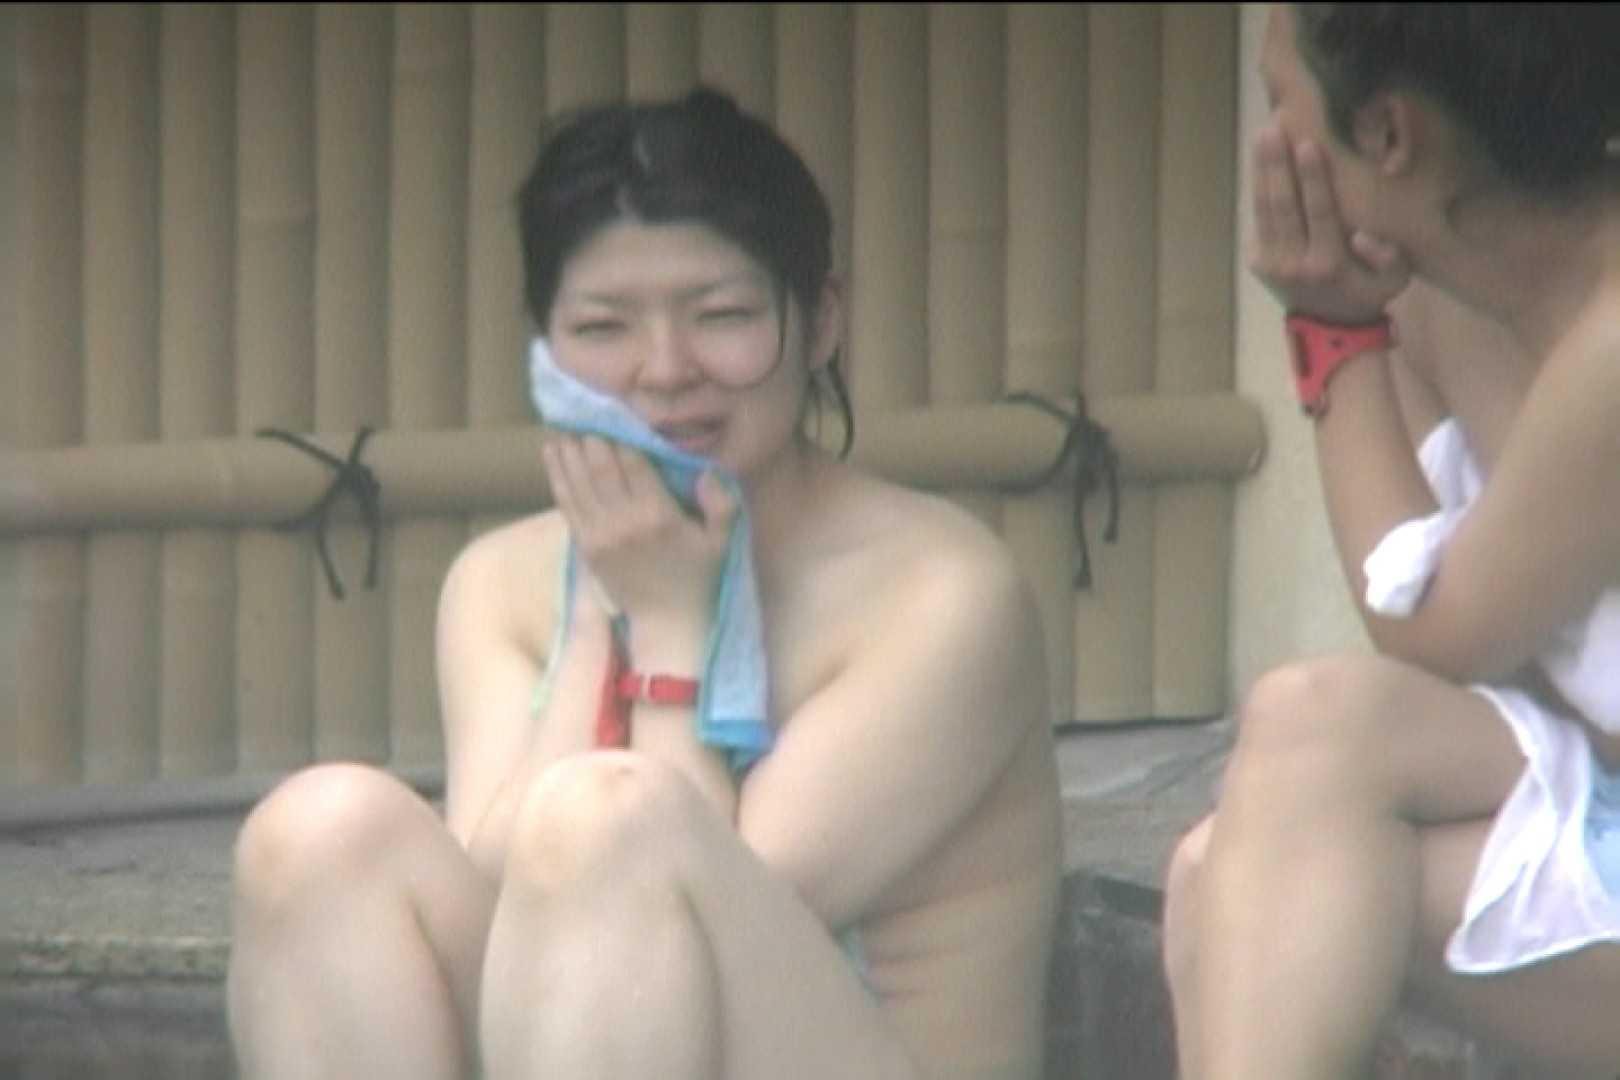 Aquaな露天風呂Vol.139 盗撮 | HなOL  53pic 53